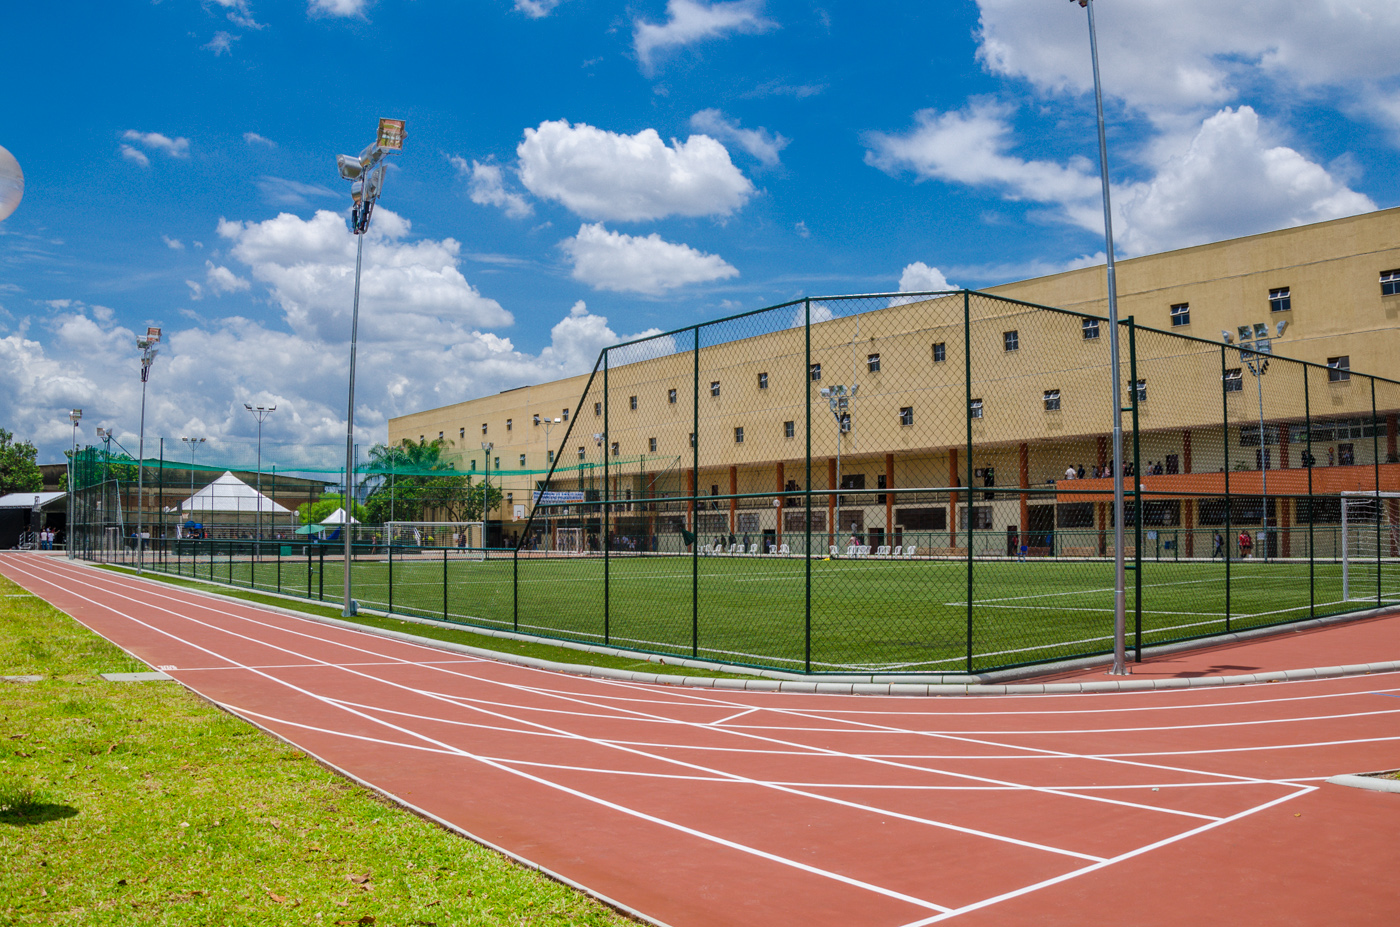 Complexo Esportivo - CEFET-MG (Campus I)